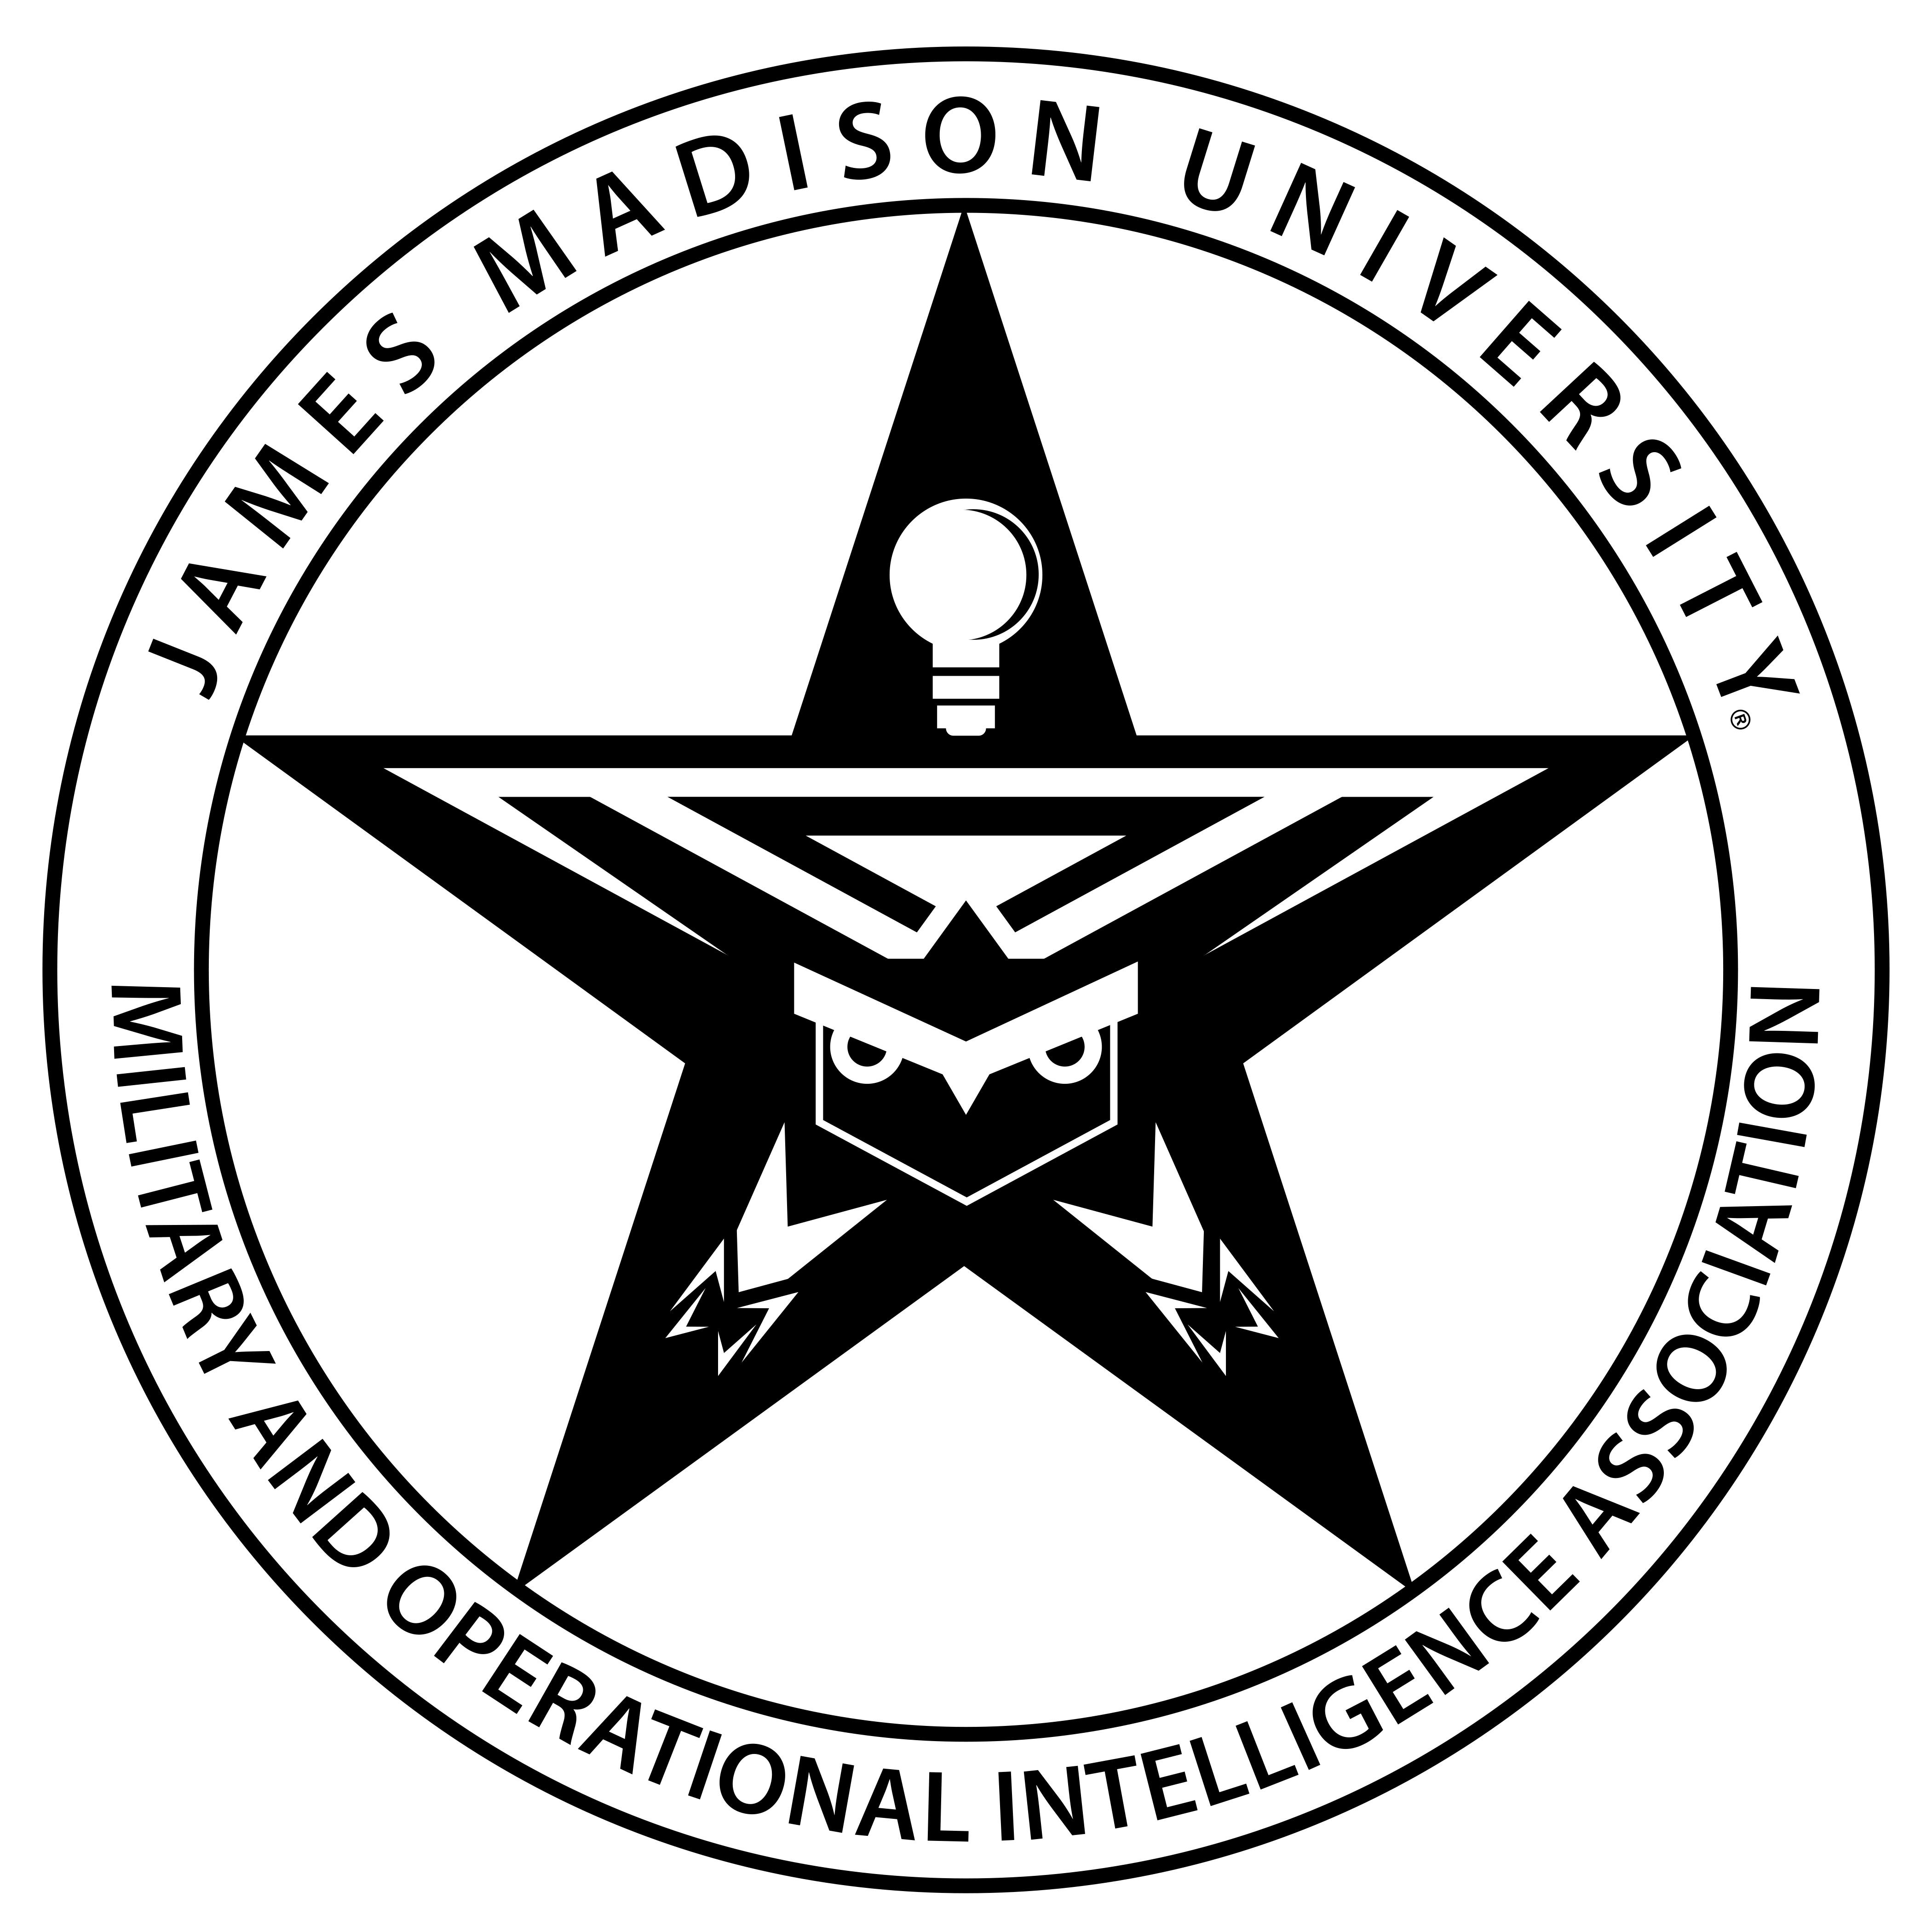 Military & Operational Intelligence Association - Be Involved